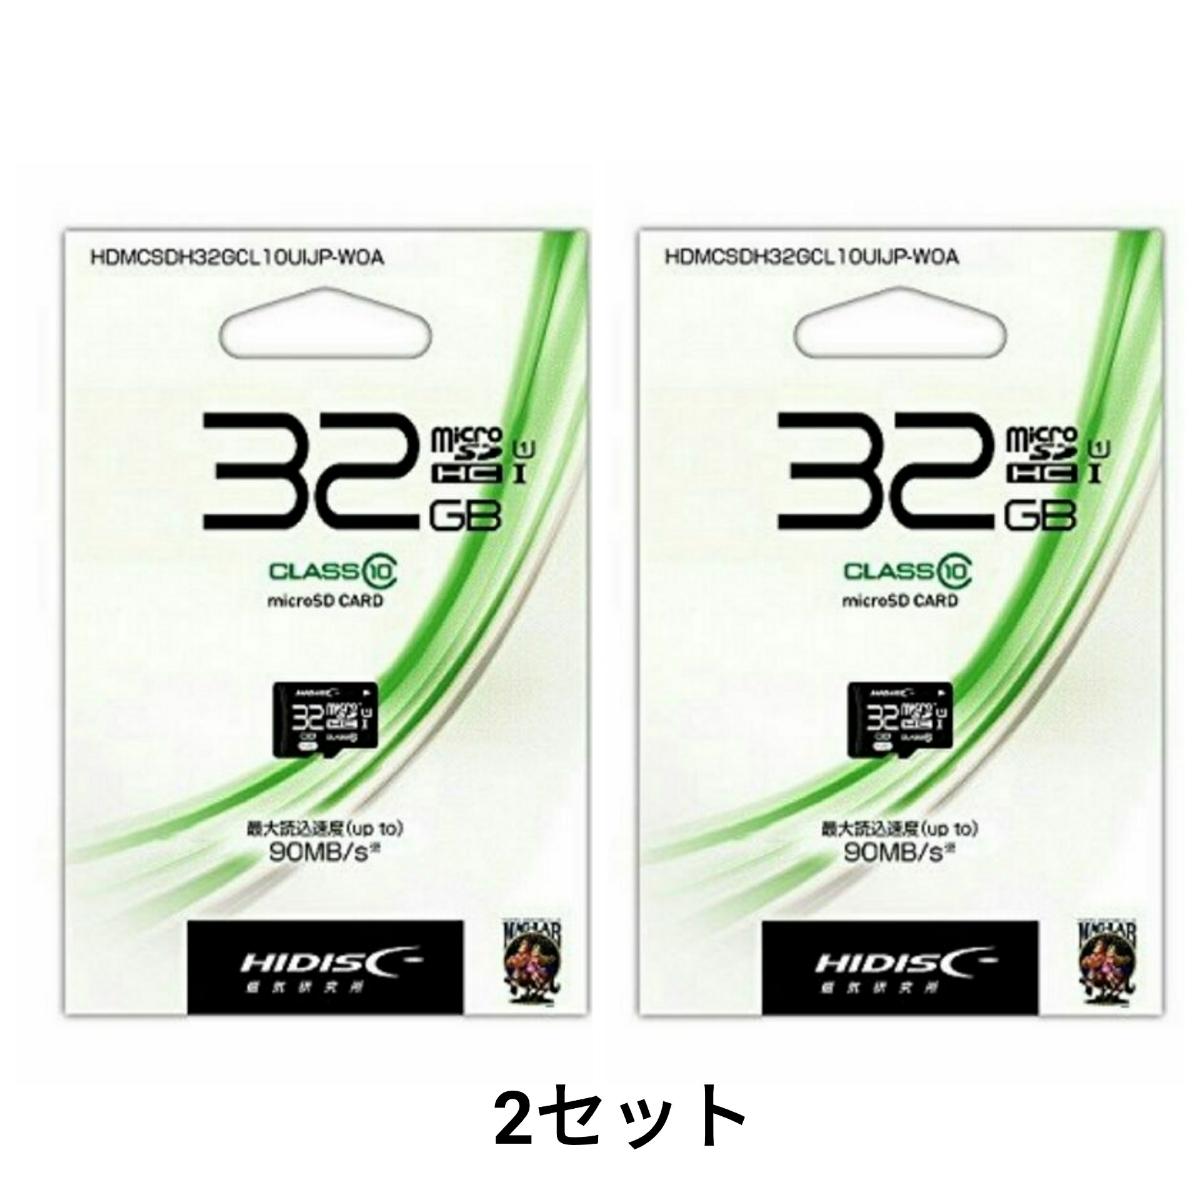 microSDHC32GB (HI-DISC)HDMCSDH32GCL10UIJP-WOA 2個セット【1円スタート出品・新品・送料無料】